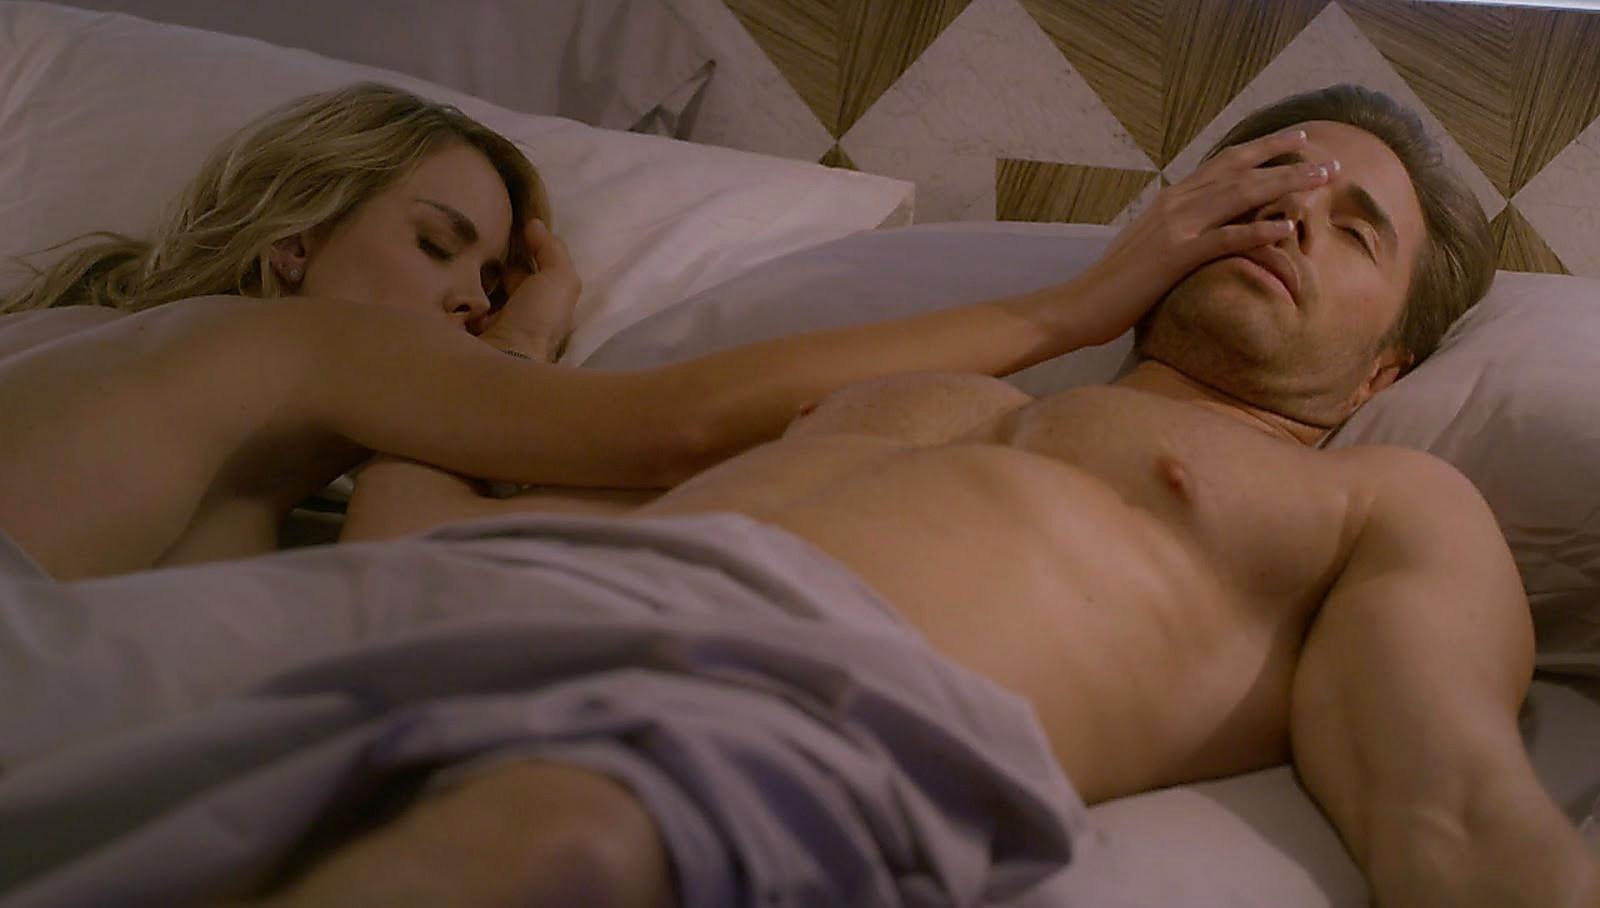 Sebastian Rulli sexy shirtless scene March 1, 2018, 3pm